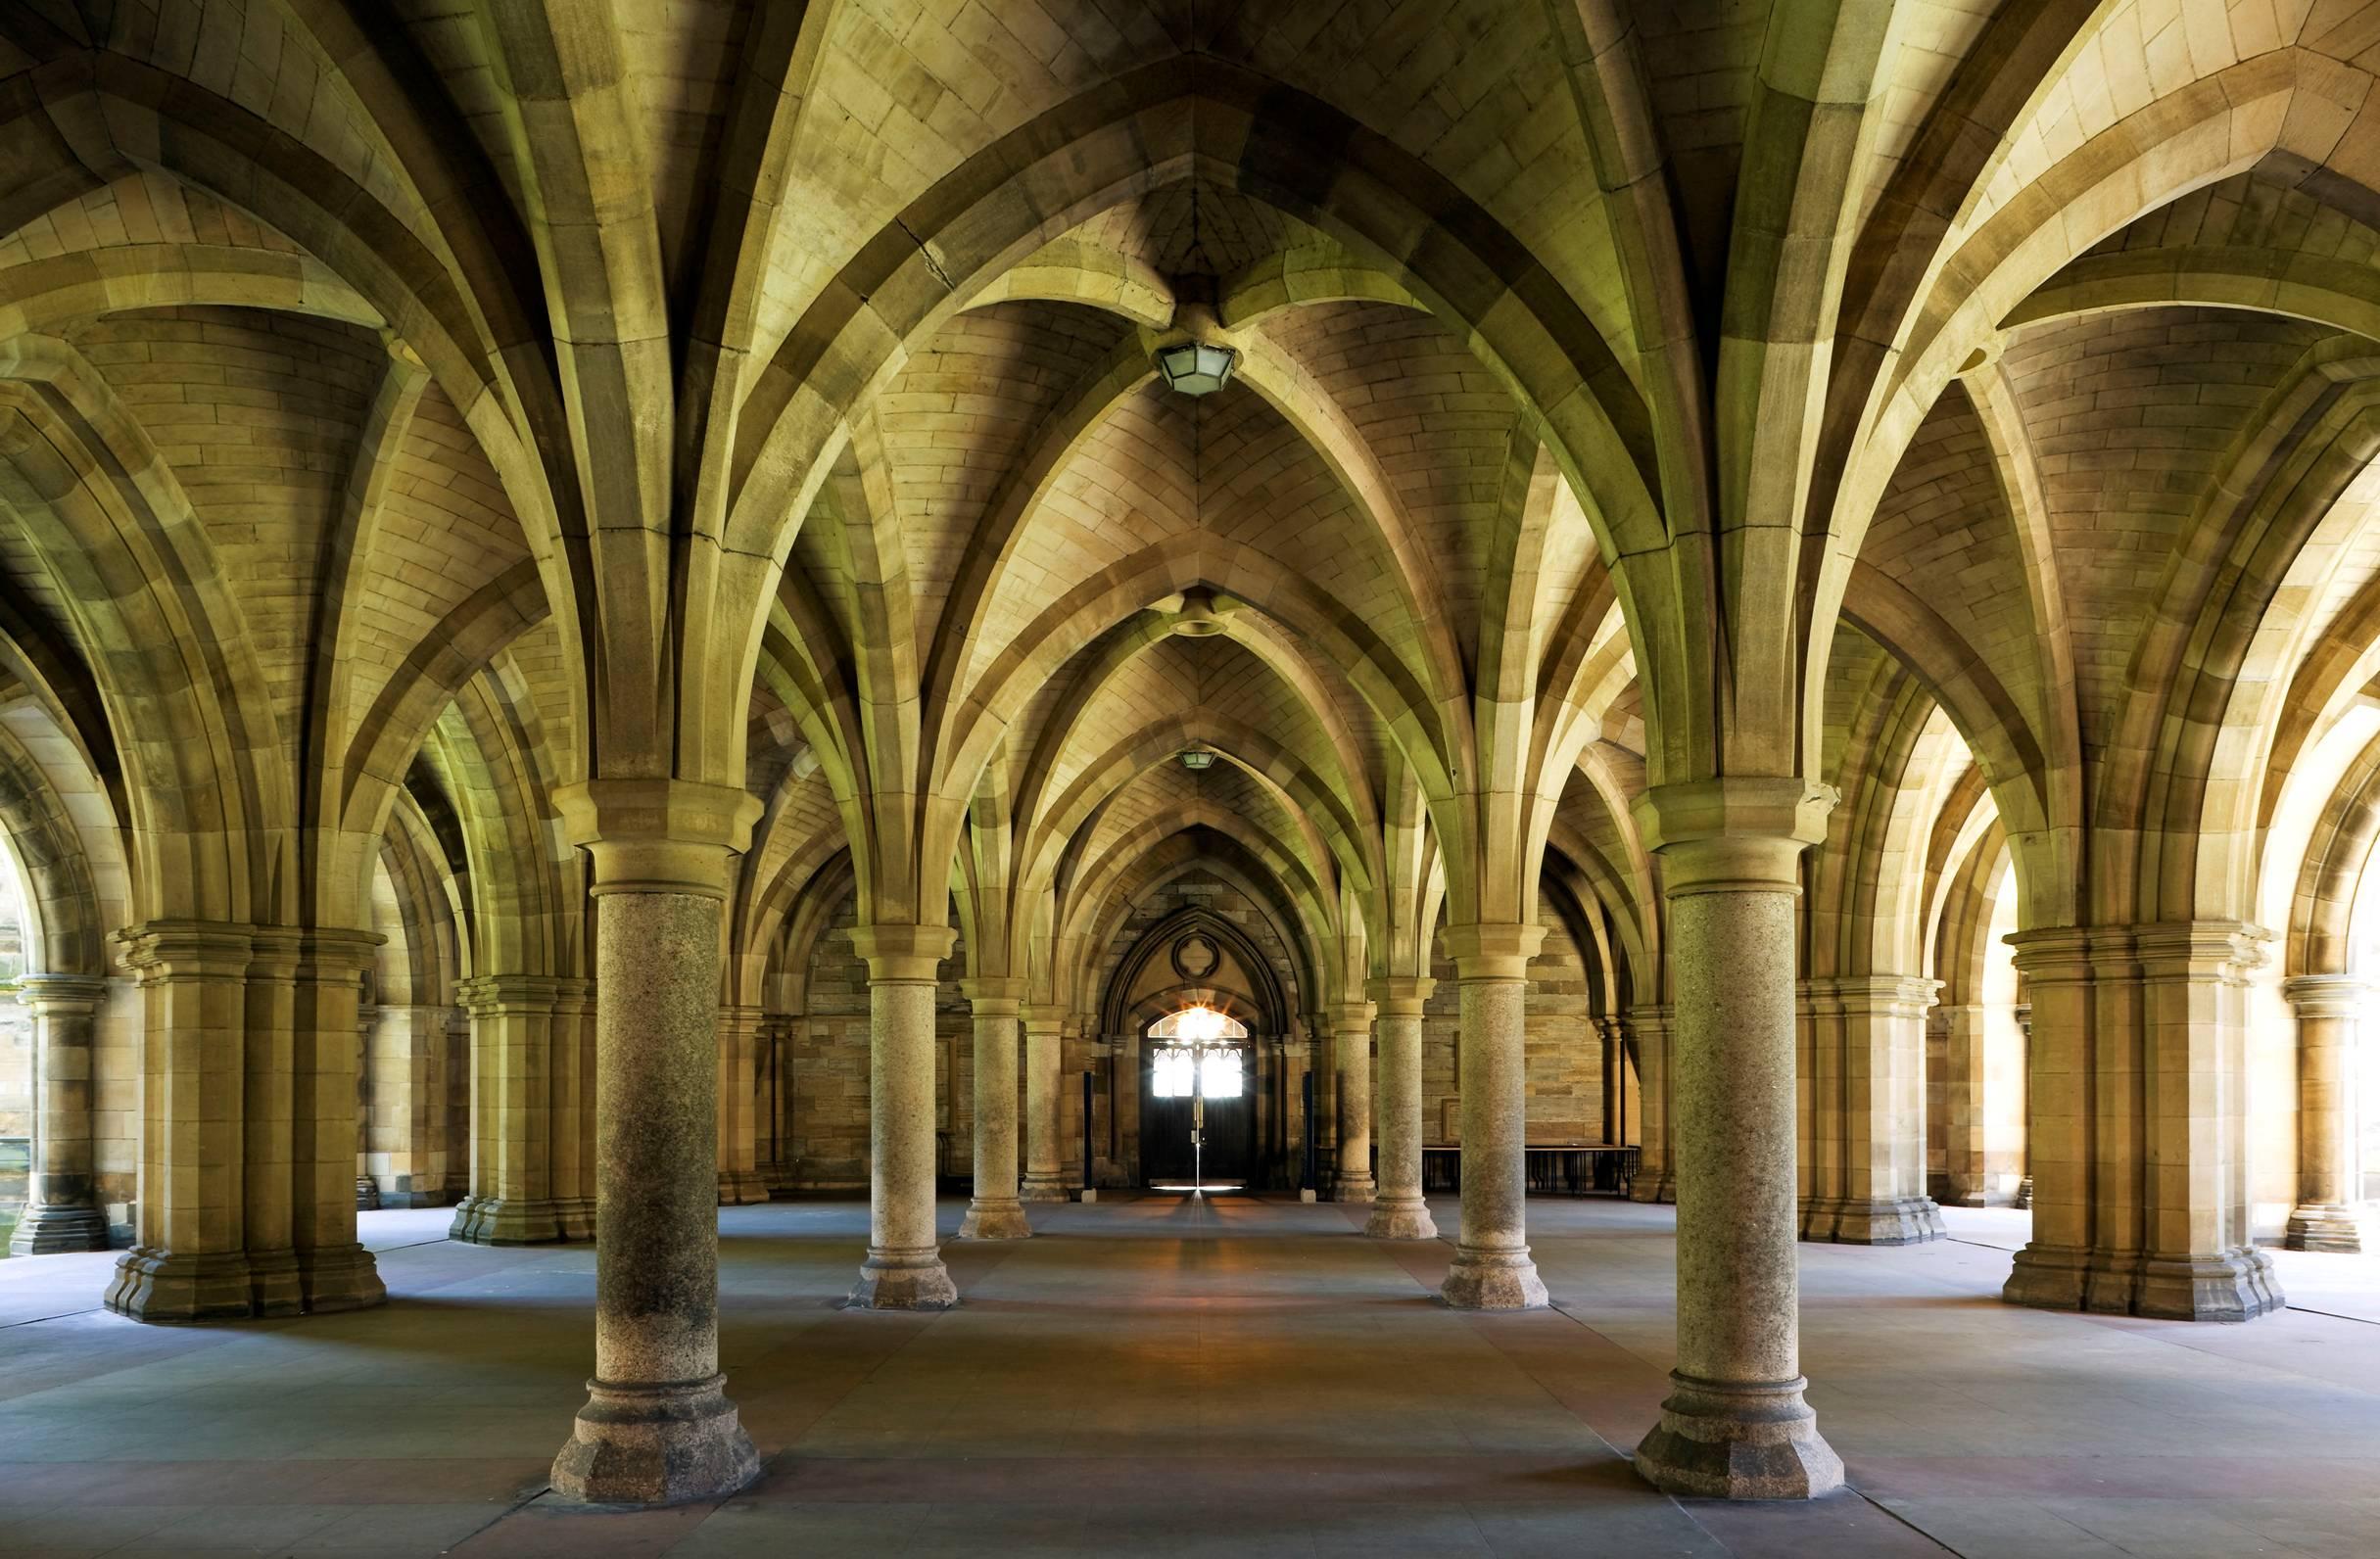 Glasgow Hires Six New Philosophers - Daily Nous